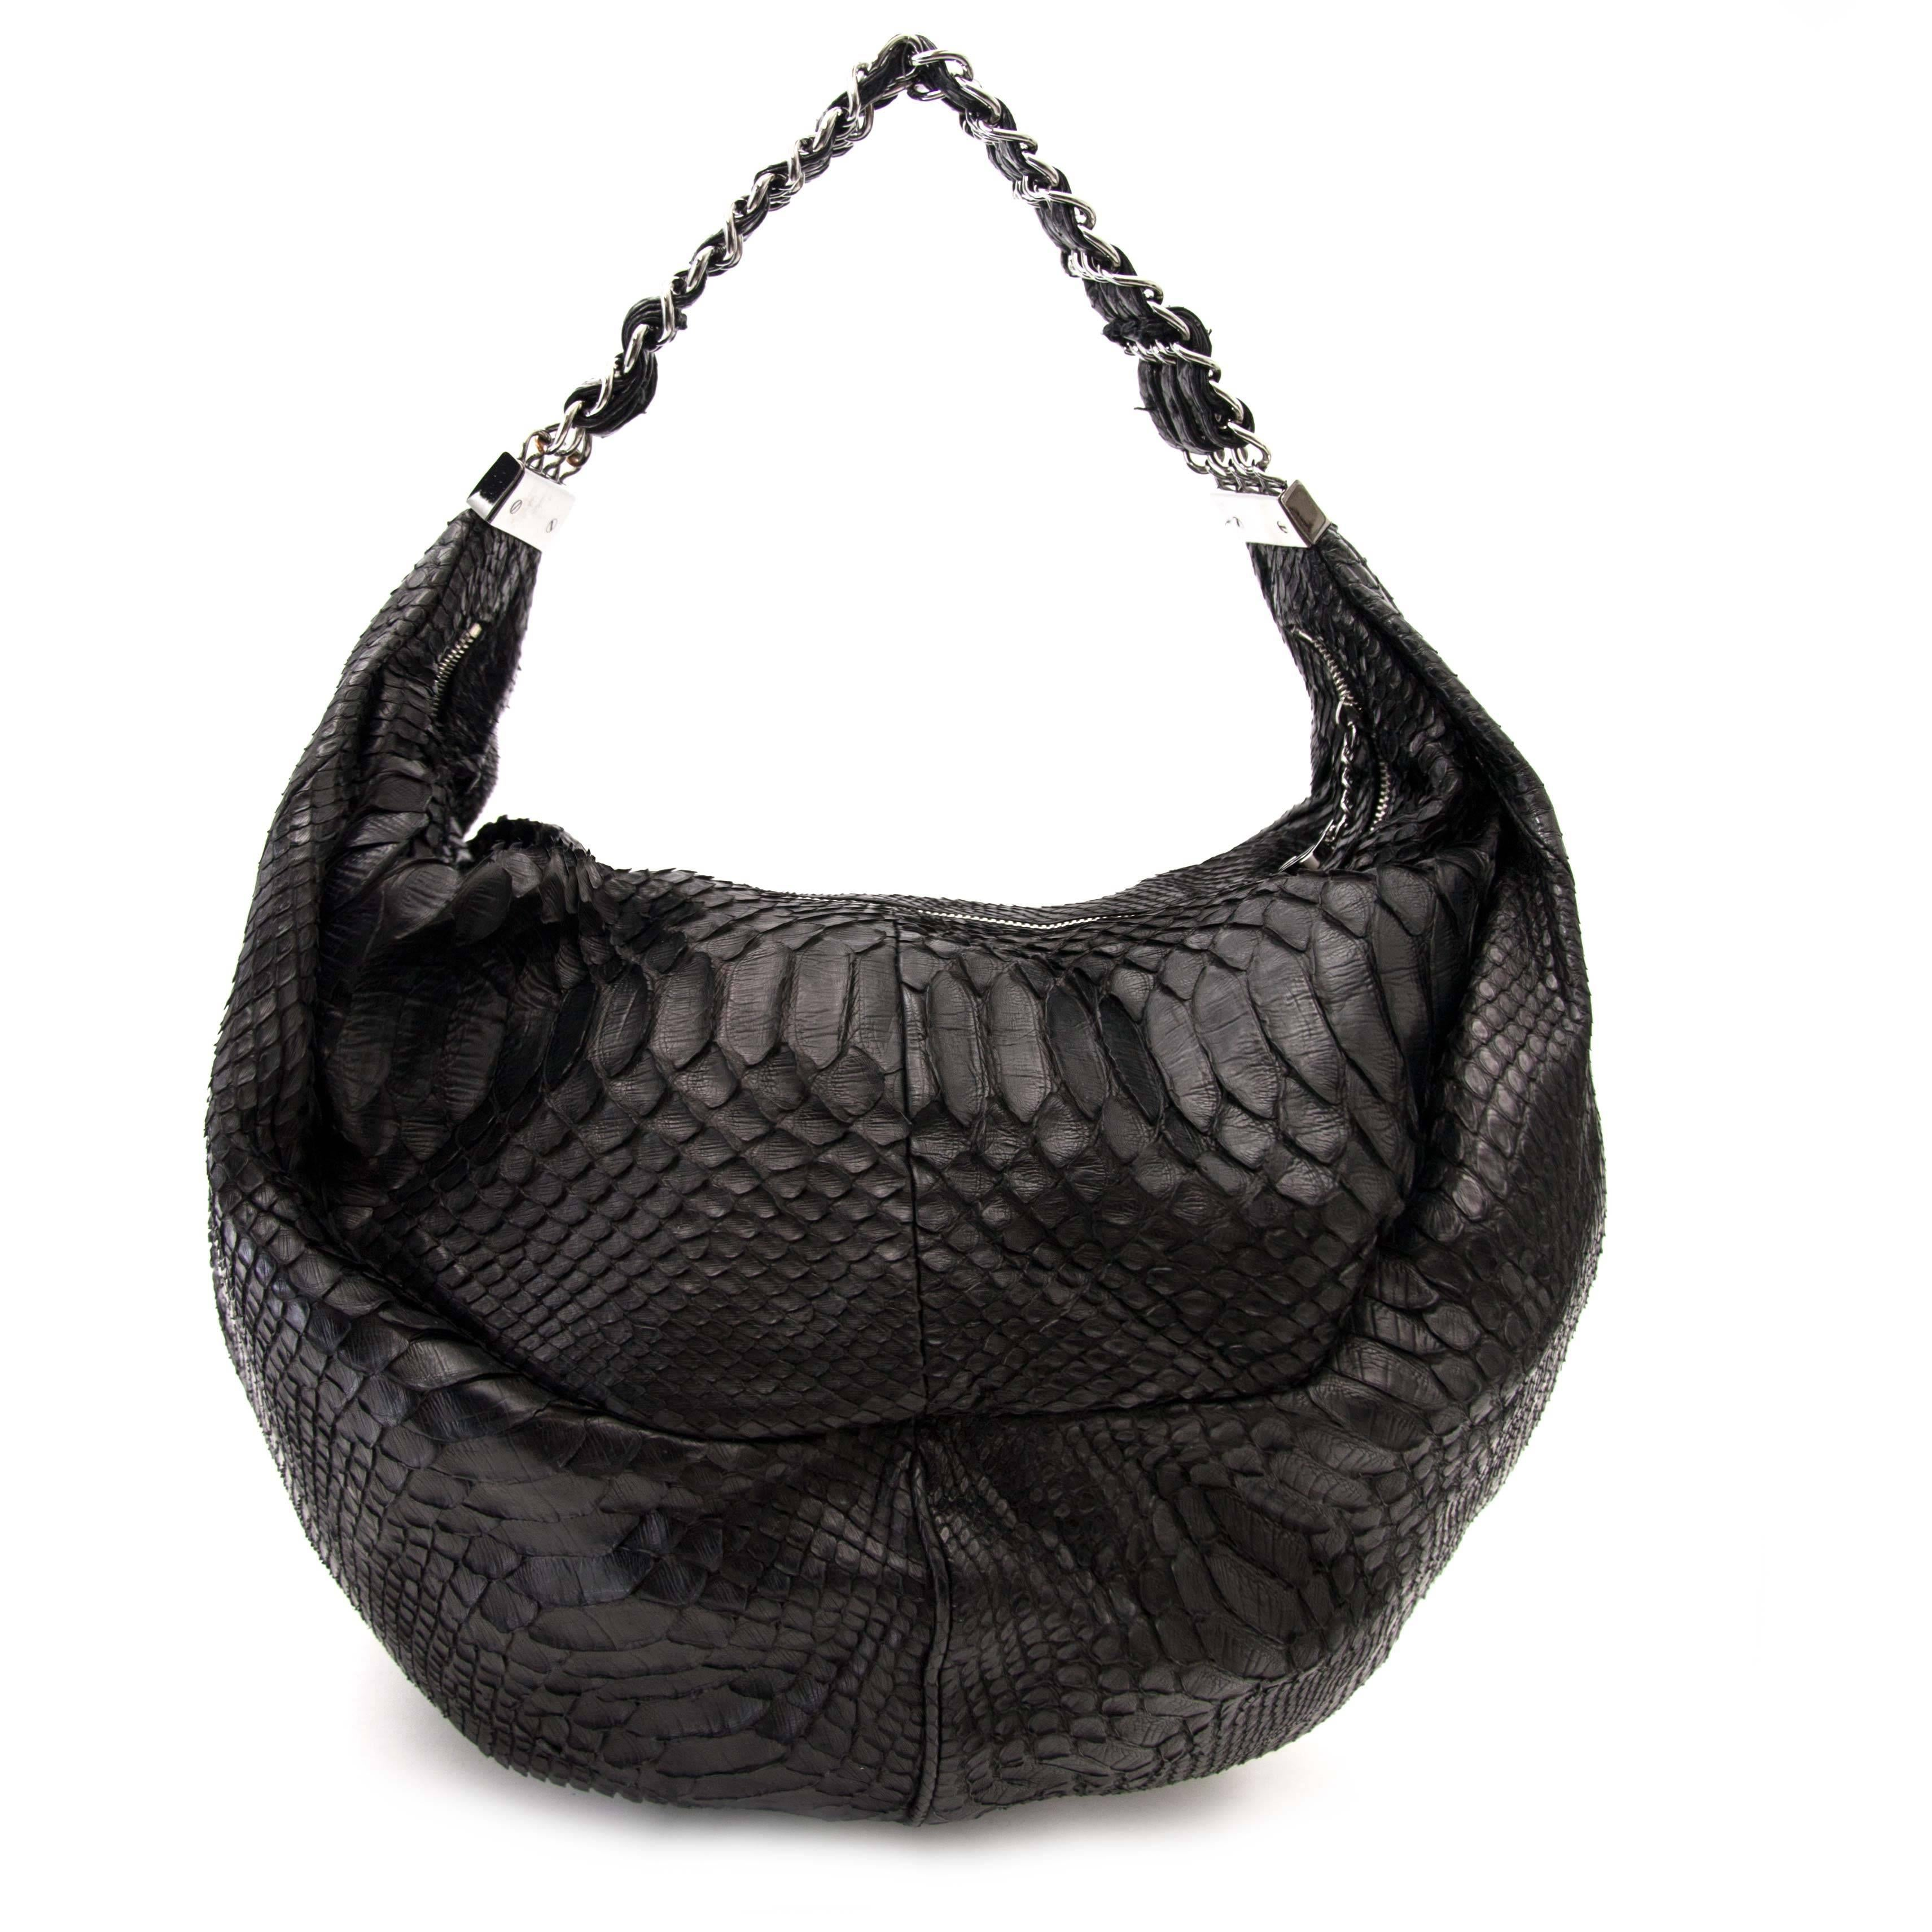 0f3cb4f01396 Chanel Python Black Hobo Bag For Sale at 1stdibs